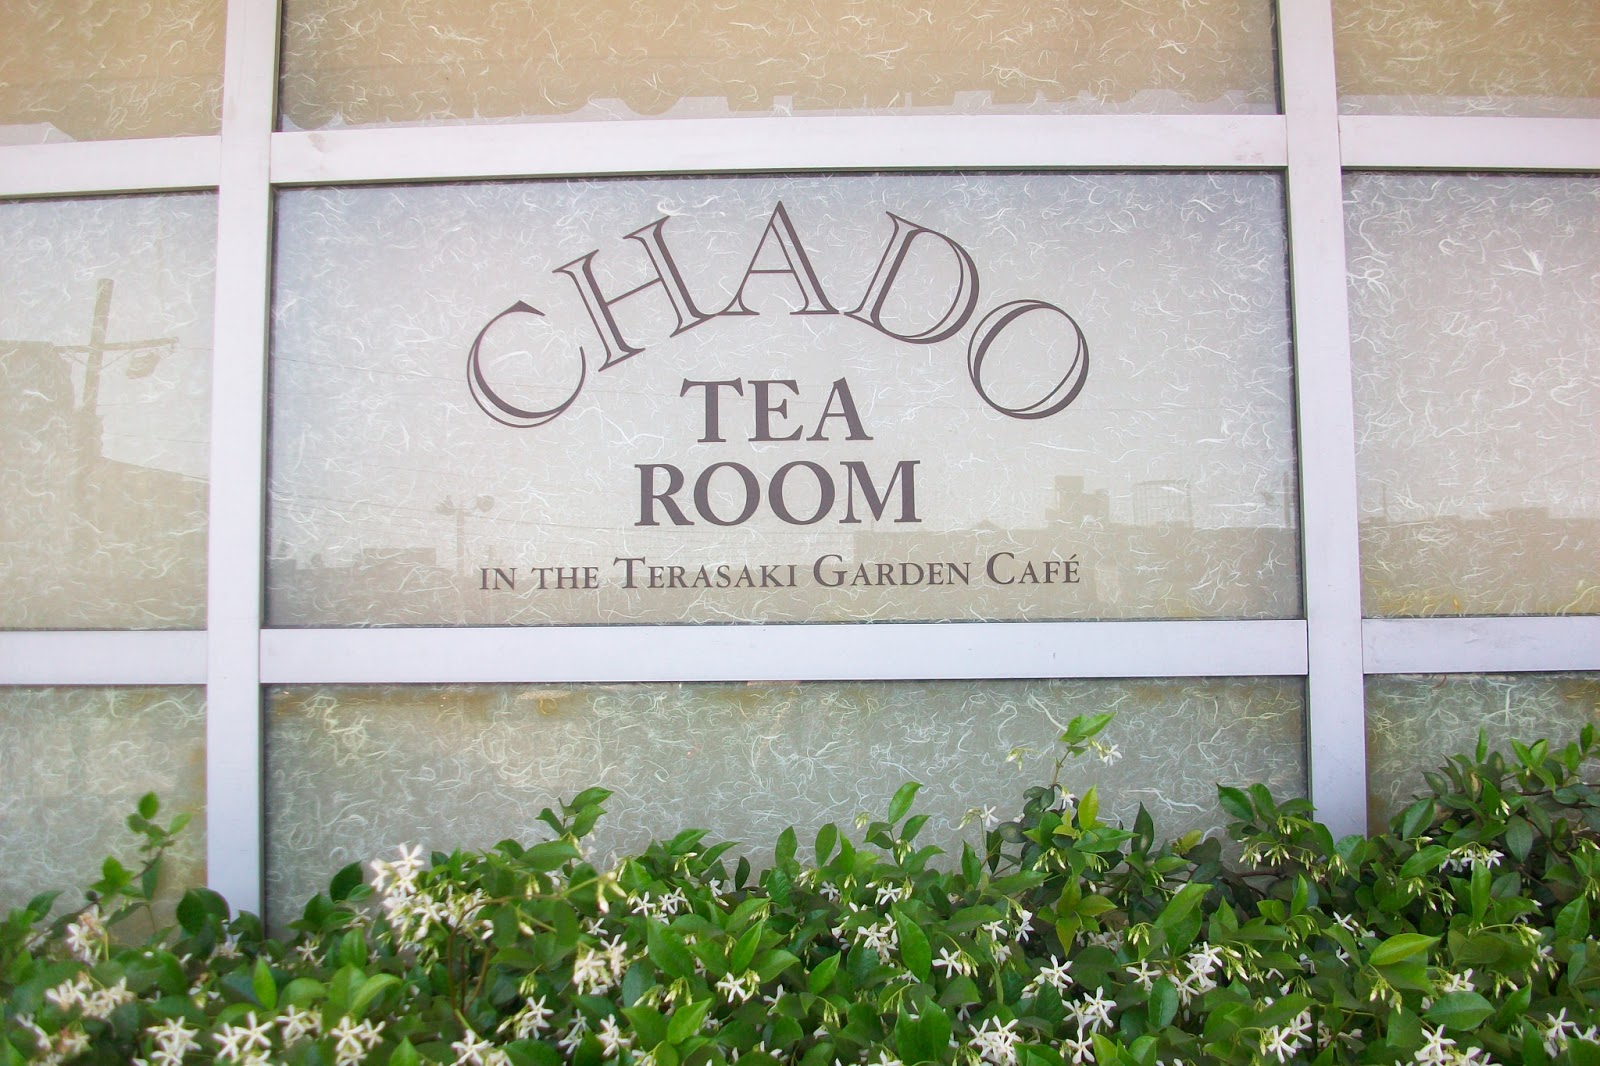 Chado Tea Room Deals on DealFly